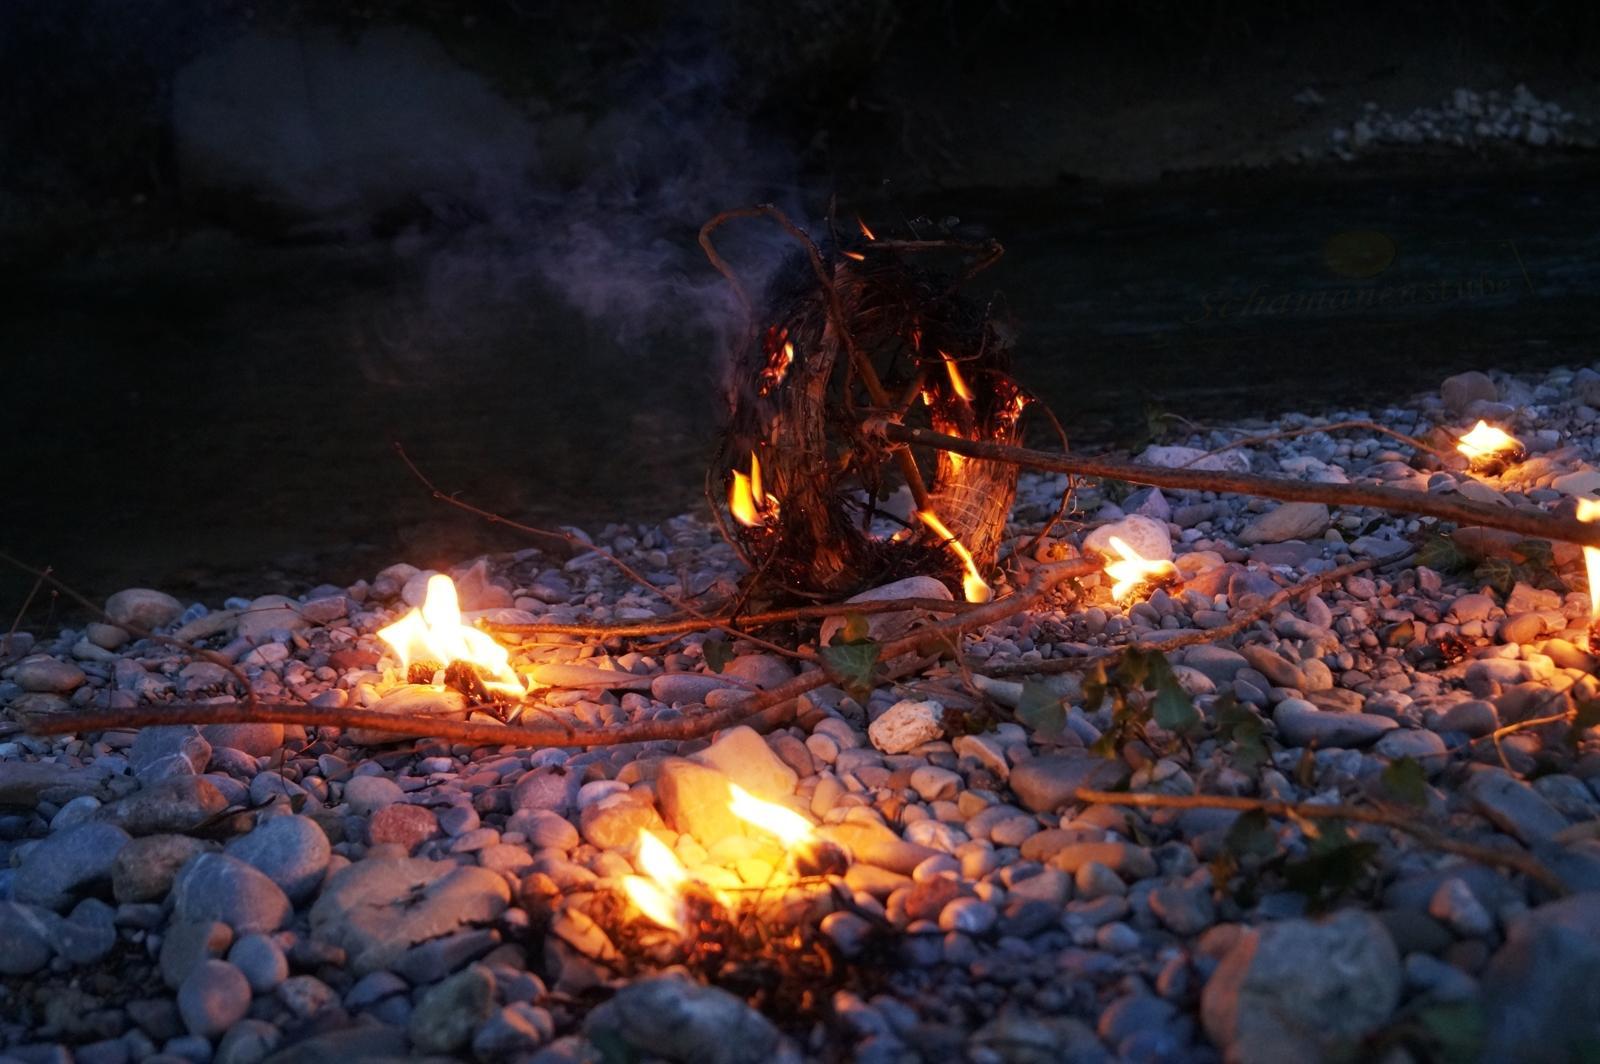 Feuerrad Ritual - Feuer